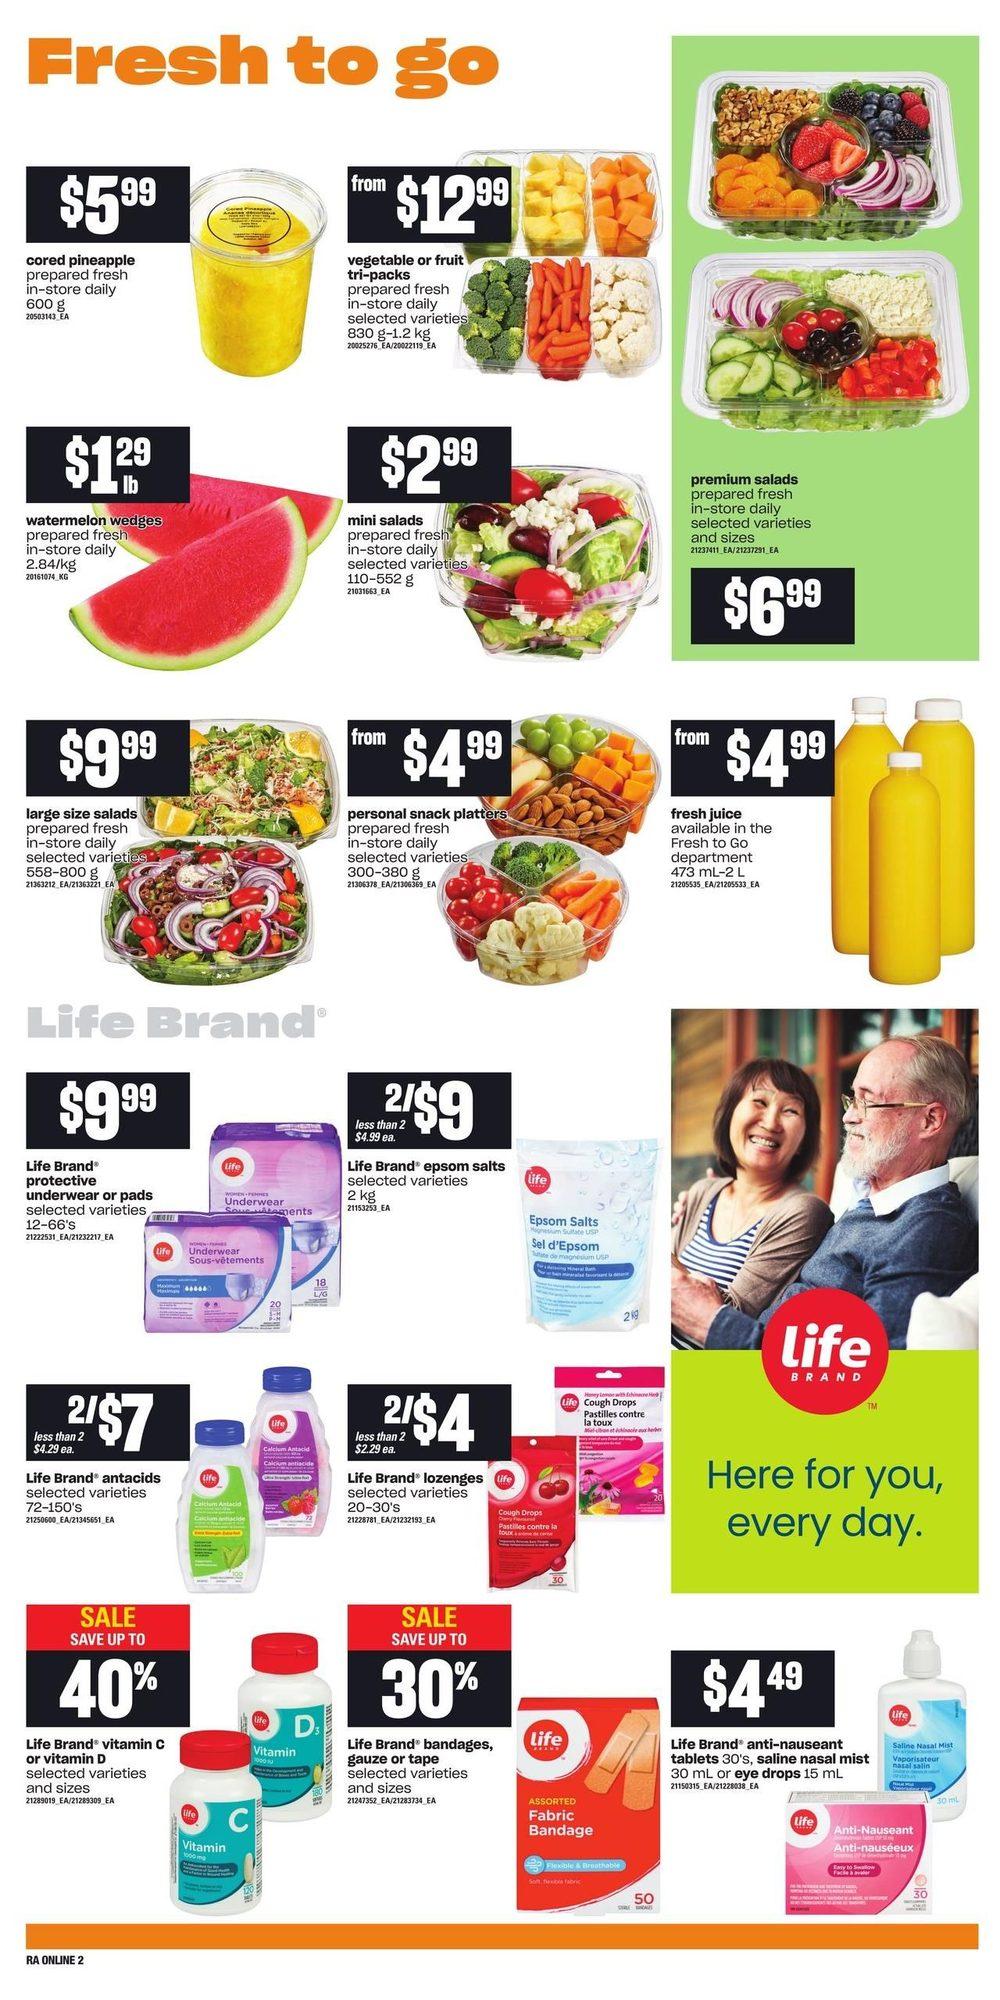 Atlantic Superstore - Weekly Flyer Specials - Page 5